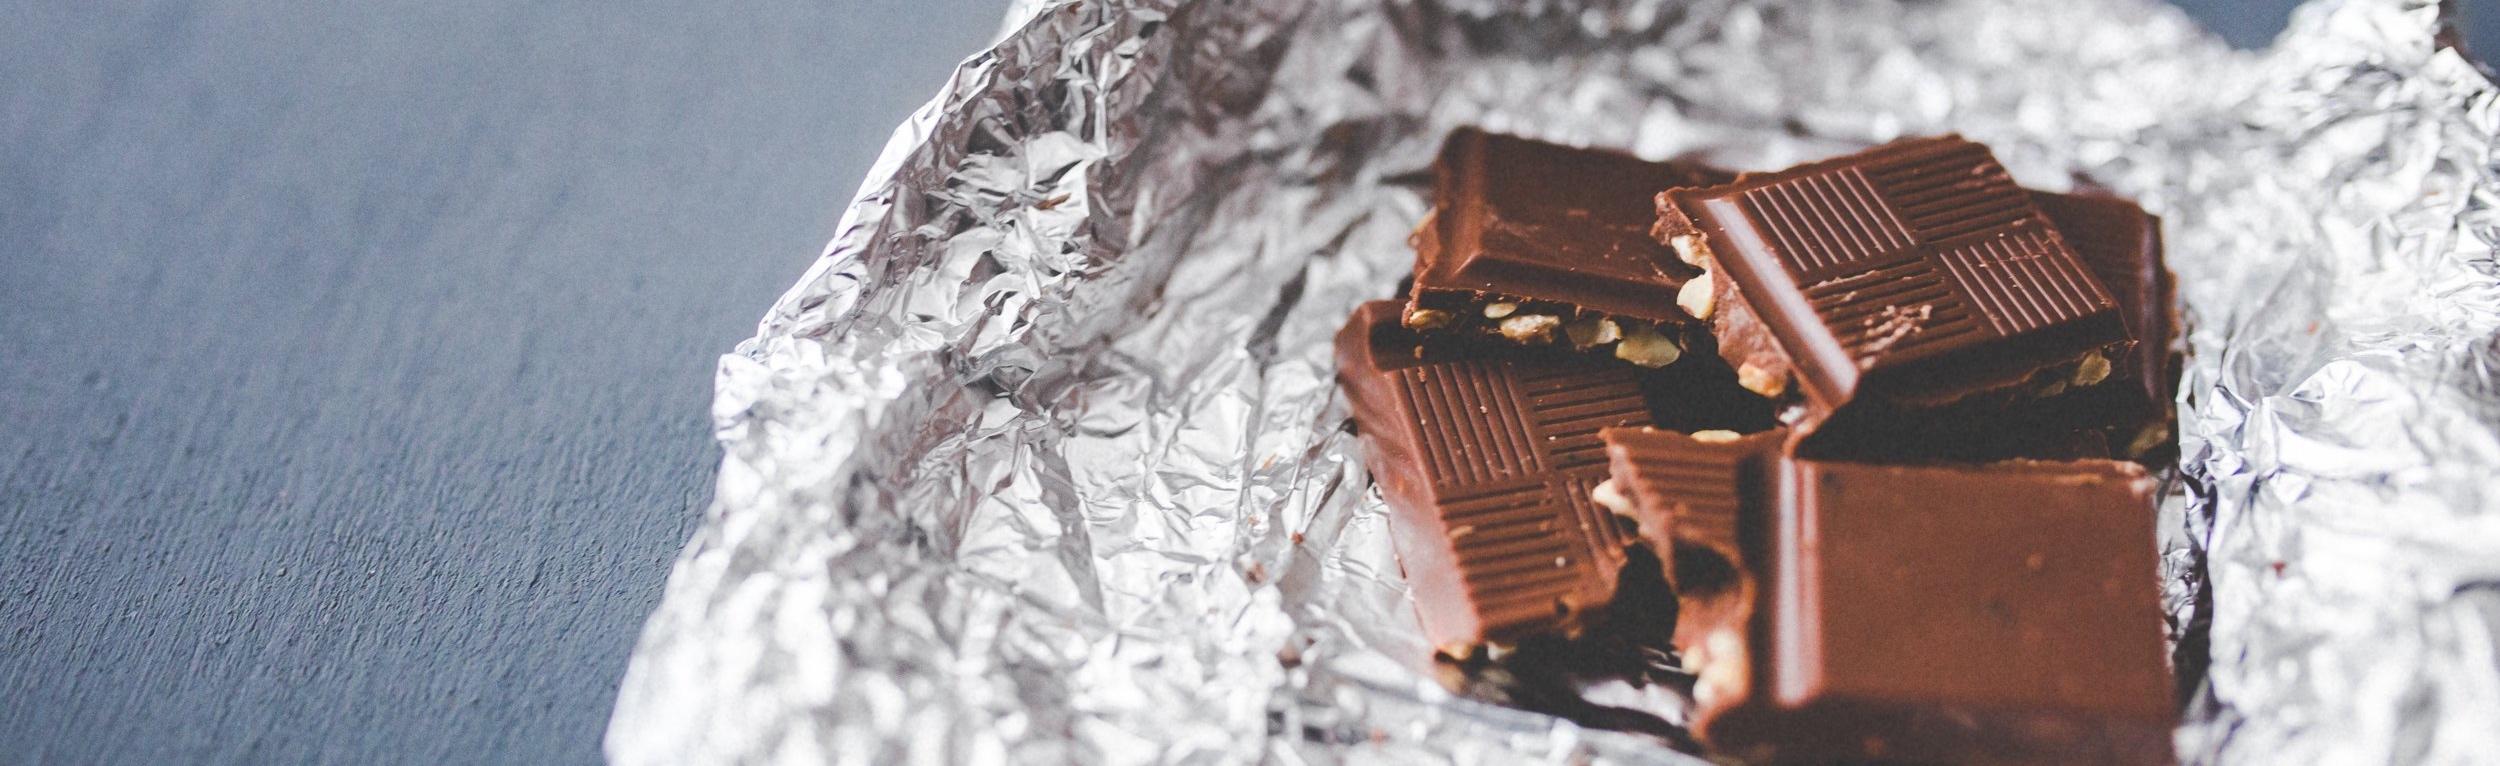 candy-chocolate-sweet-6345.jpg